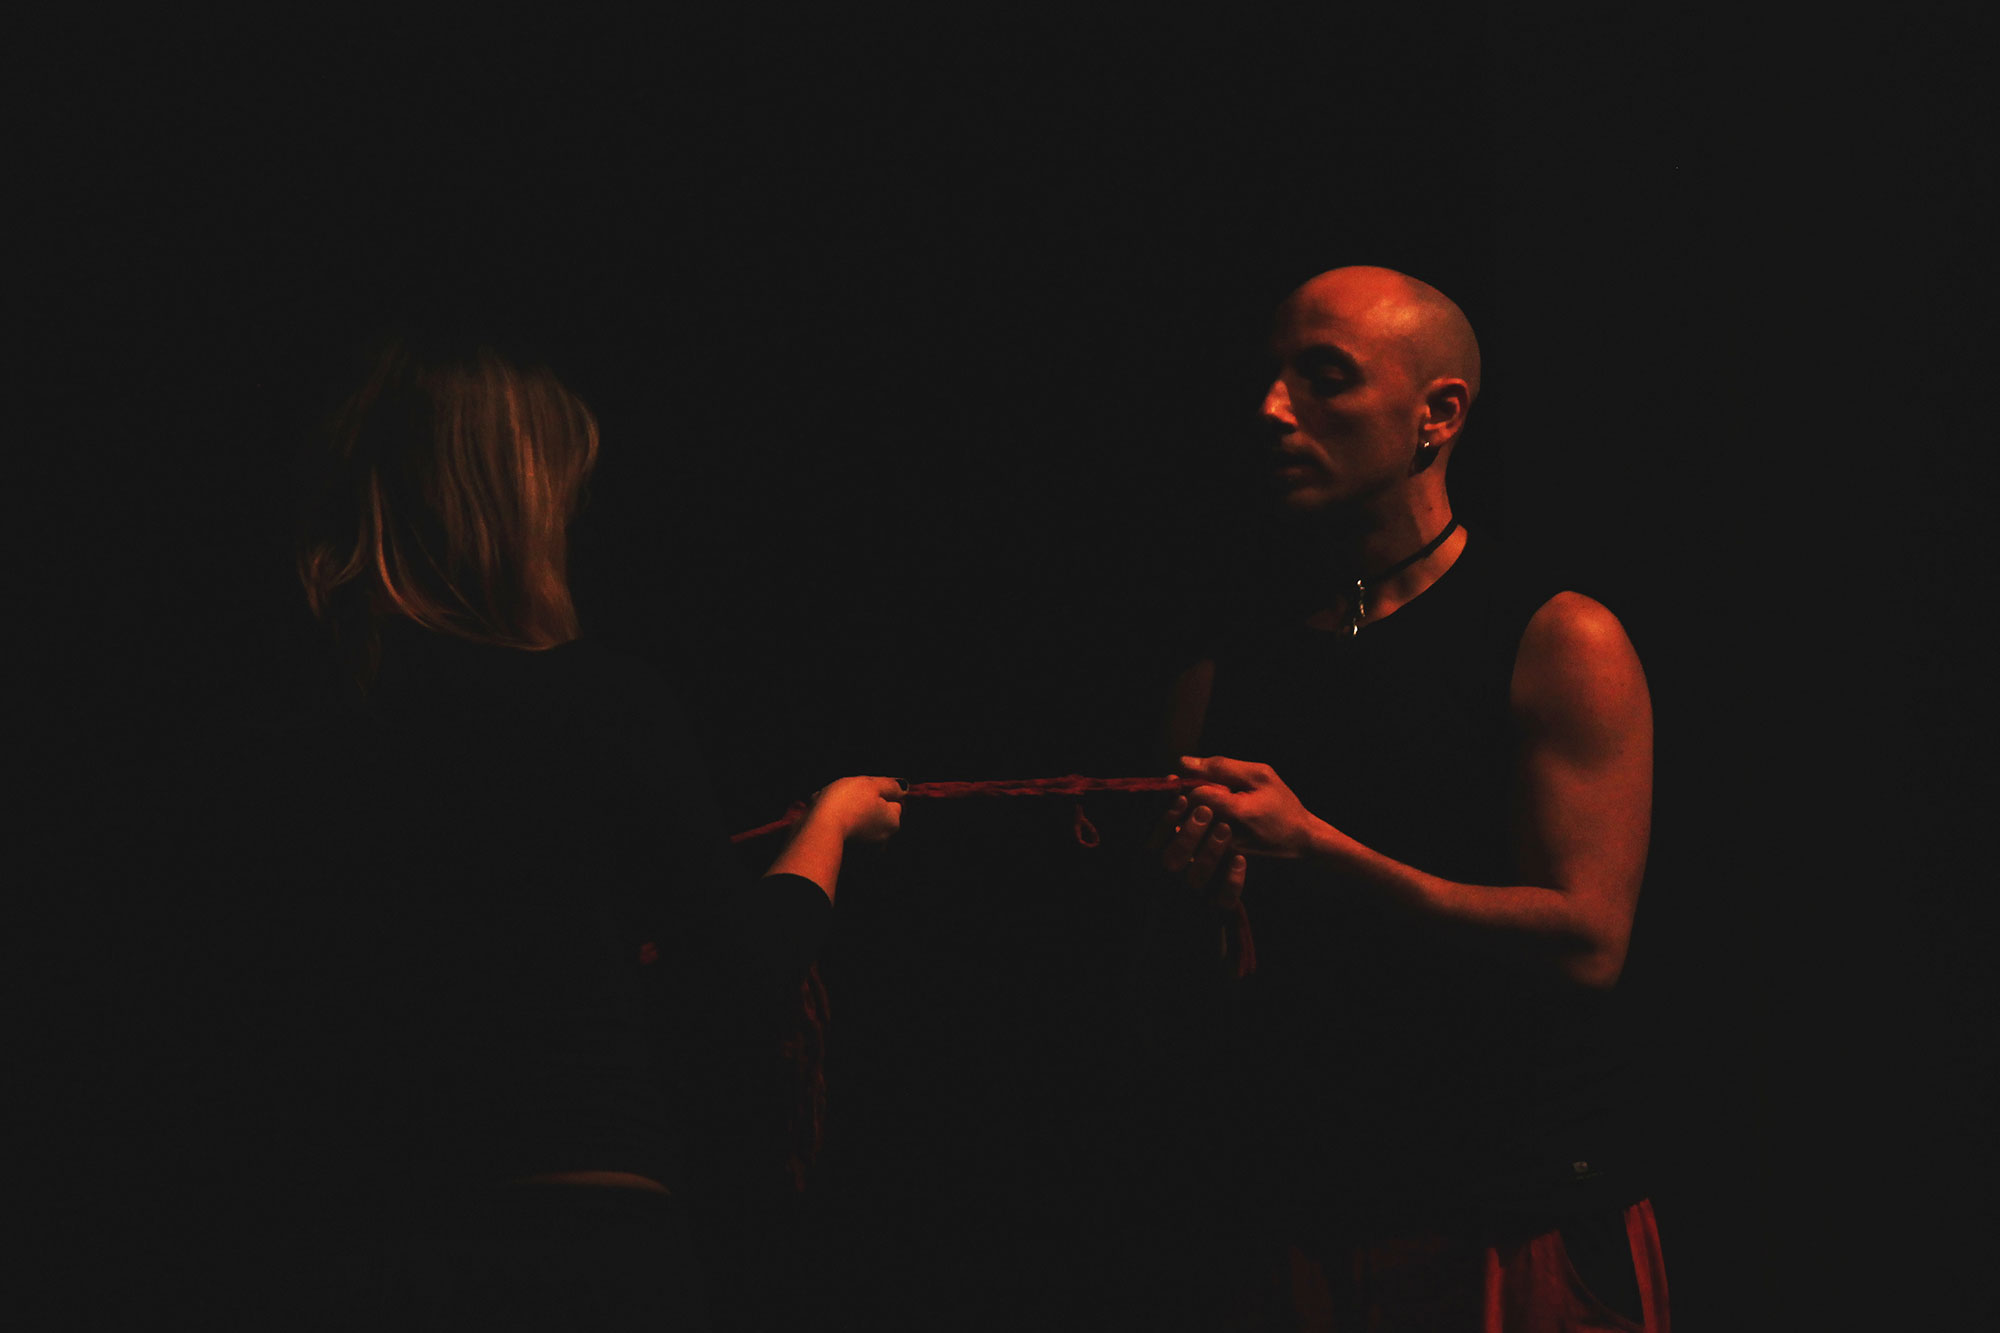 Round Trip | Teatro Binario 7 - Monza_6